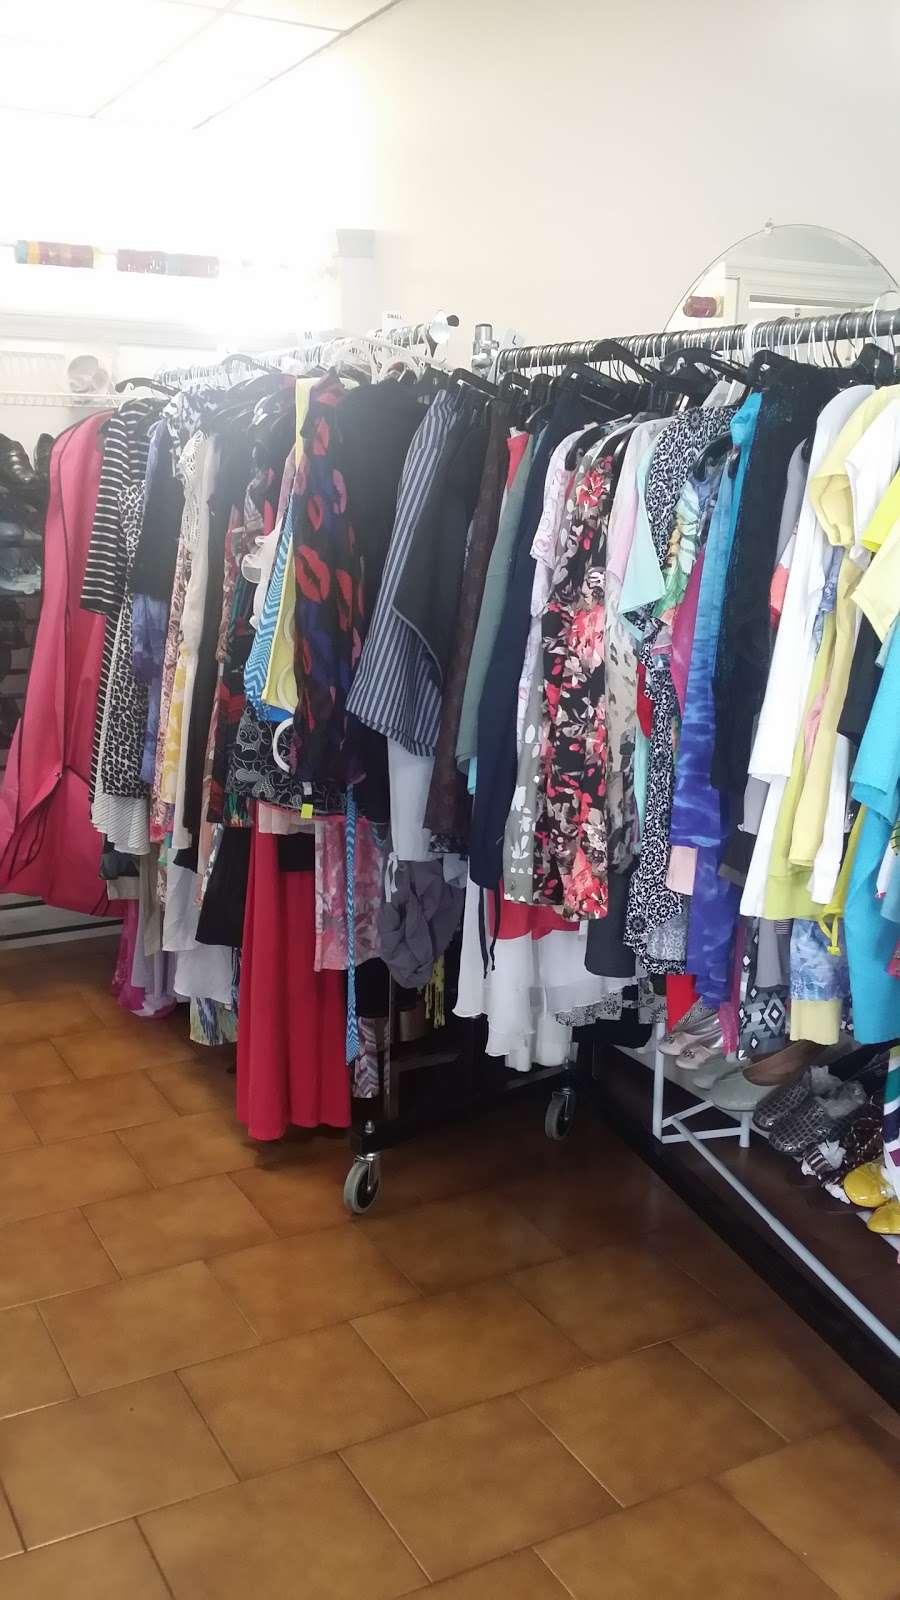 Glow Thrift Shop Store - clothing store  | Photo 2 of 10 | Address: 561 Palisade Ave, Jersey City, NJ 07307, USA | Phone: (646) 399-7397